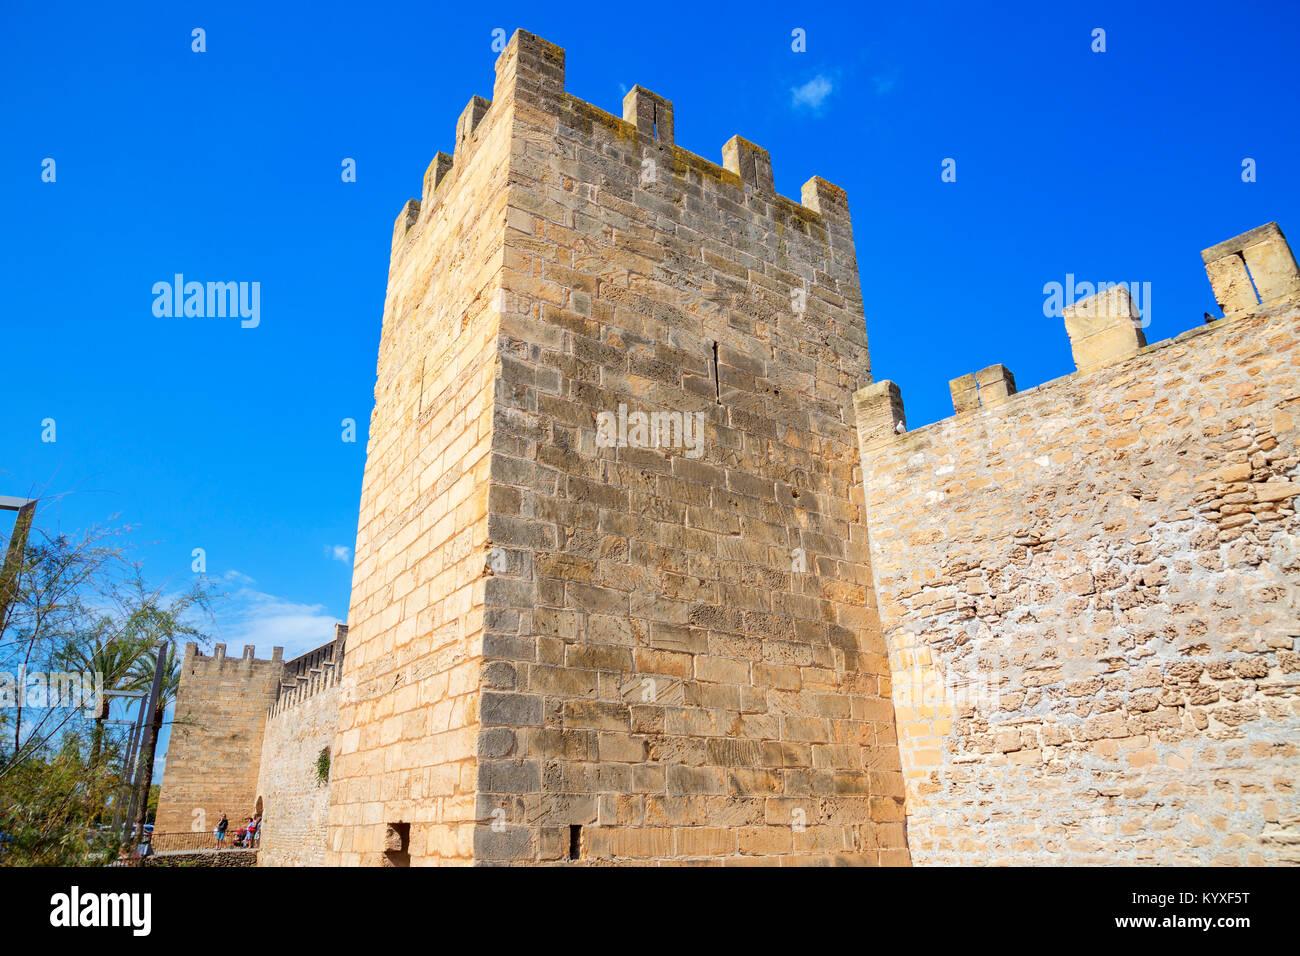 The medieval walls of Alcudia, Alcudia, Mallorca, Balearic Islands, Spain, Europe Stock Photo